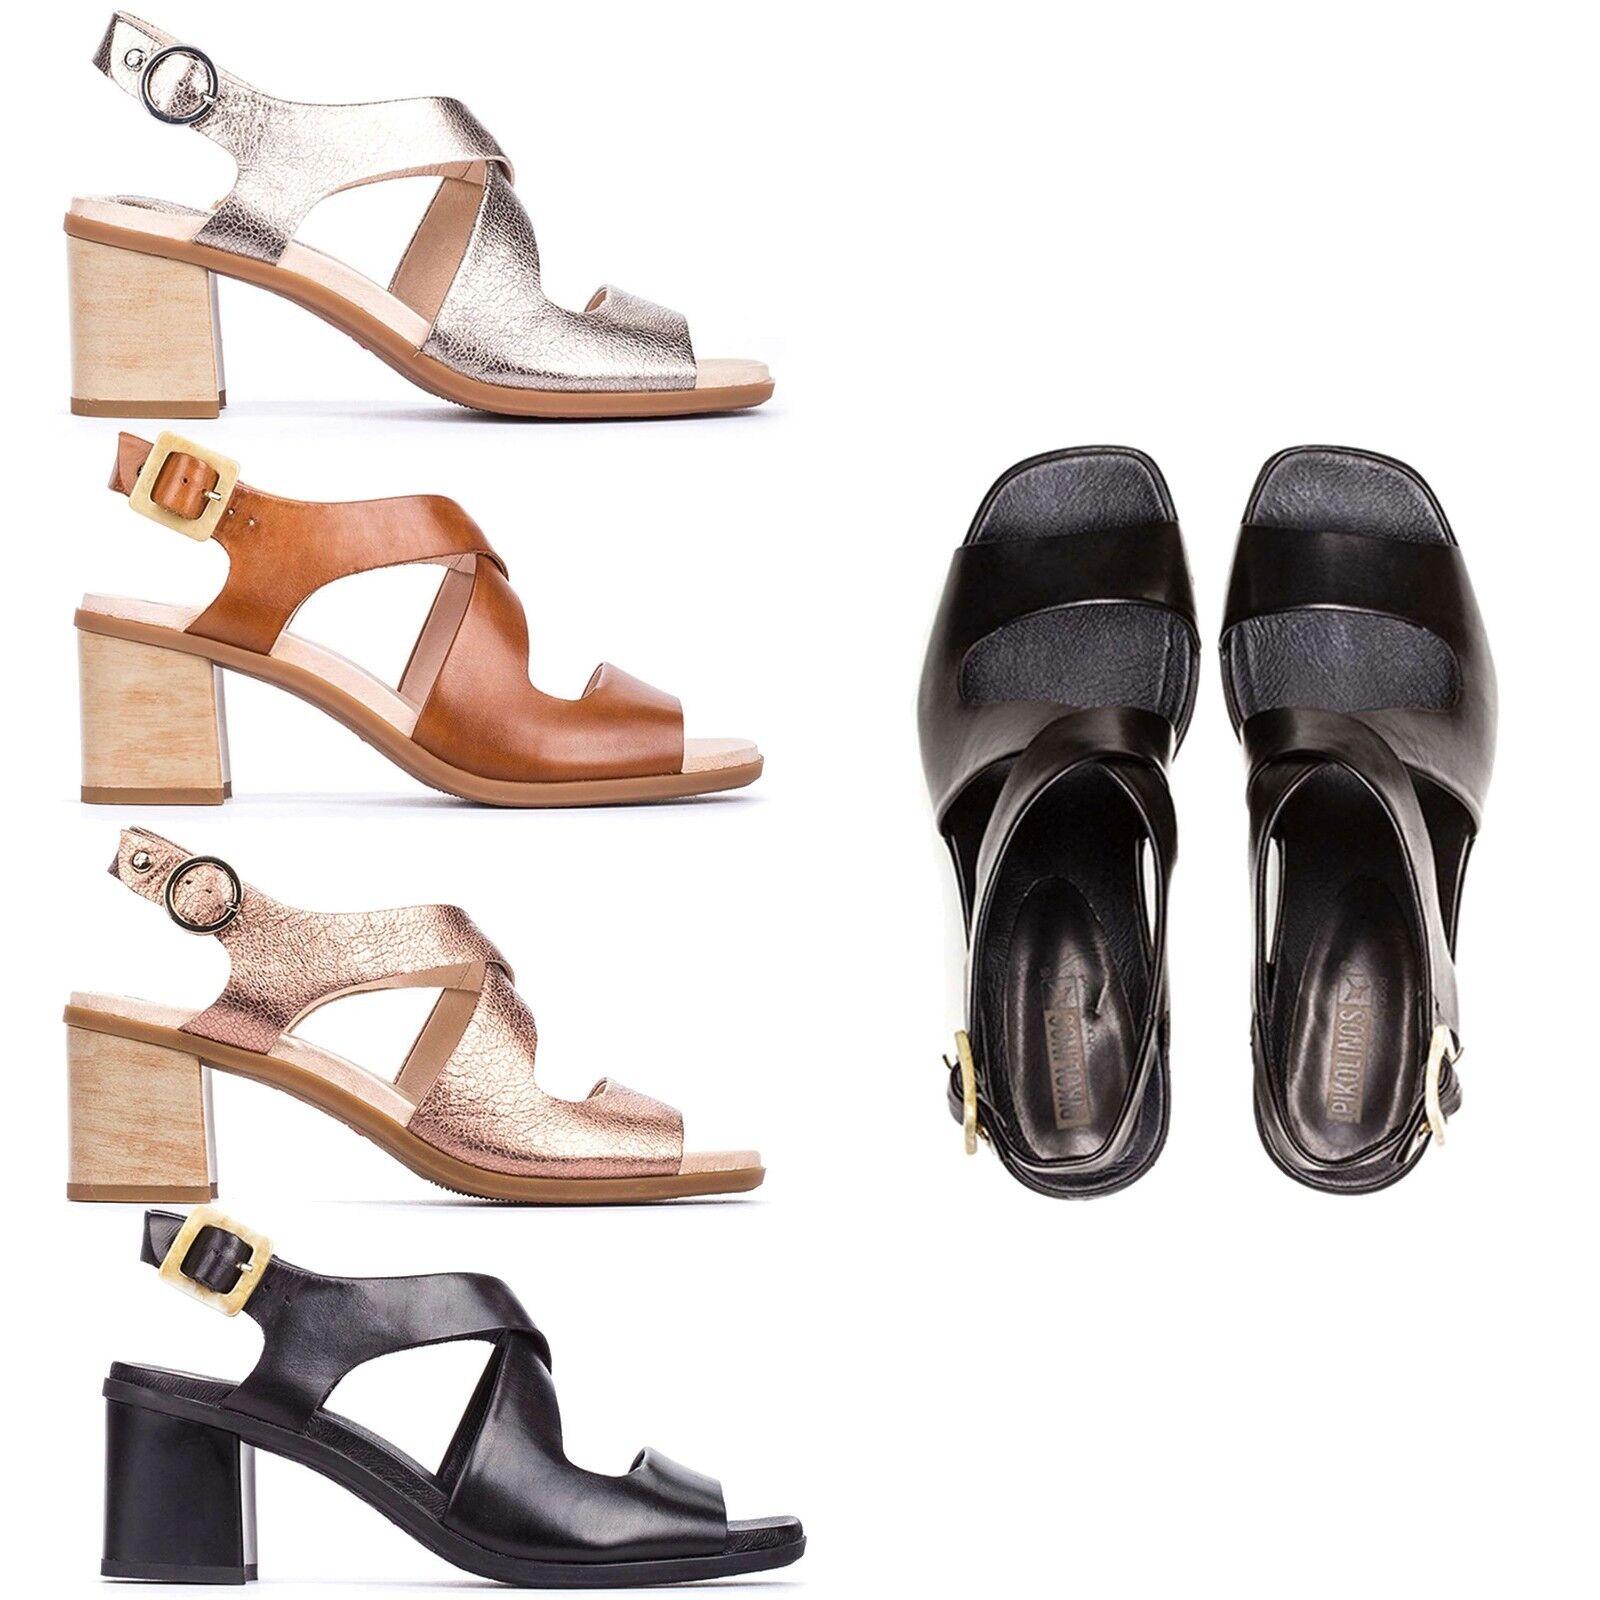 NEW Pikolinos Damens's Sandales Denia Comfort Leder Schuhes 2.75 '' Heel